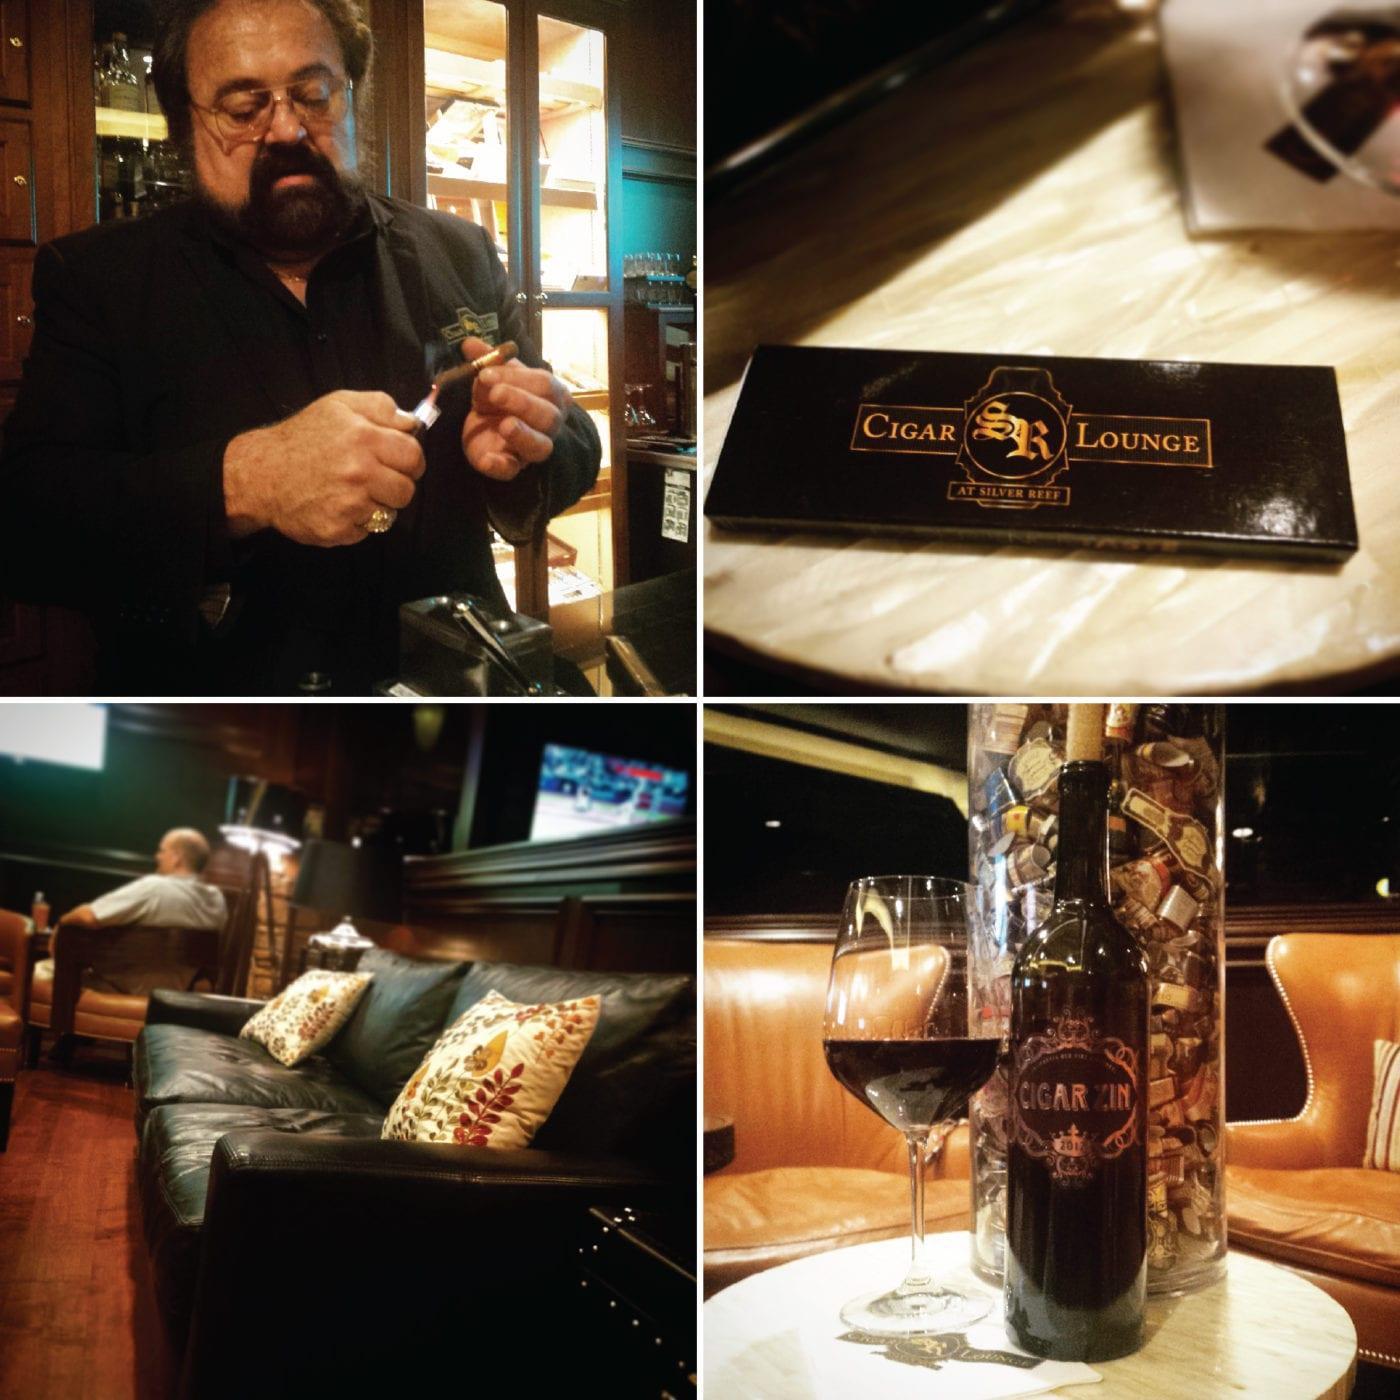 Silver Reef Casino, Cigar Lounge